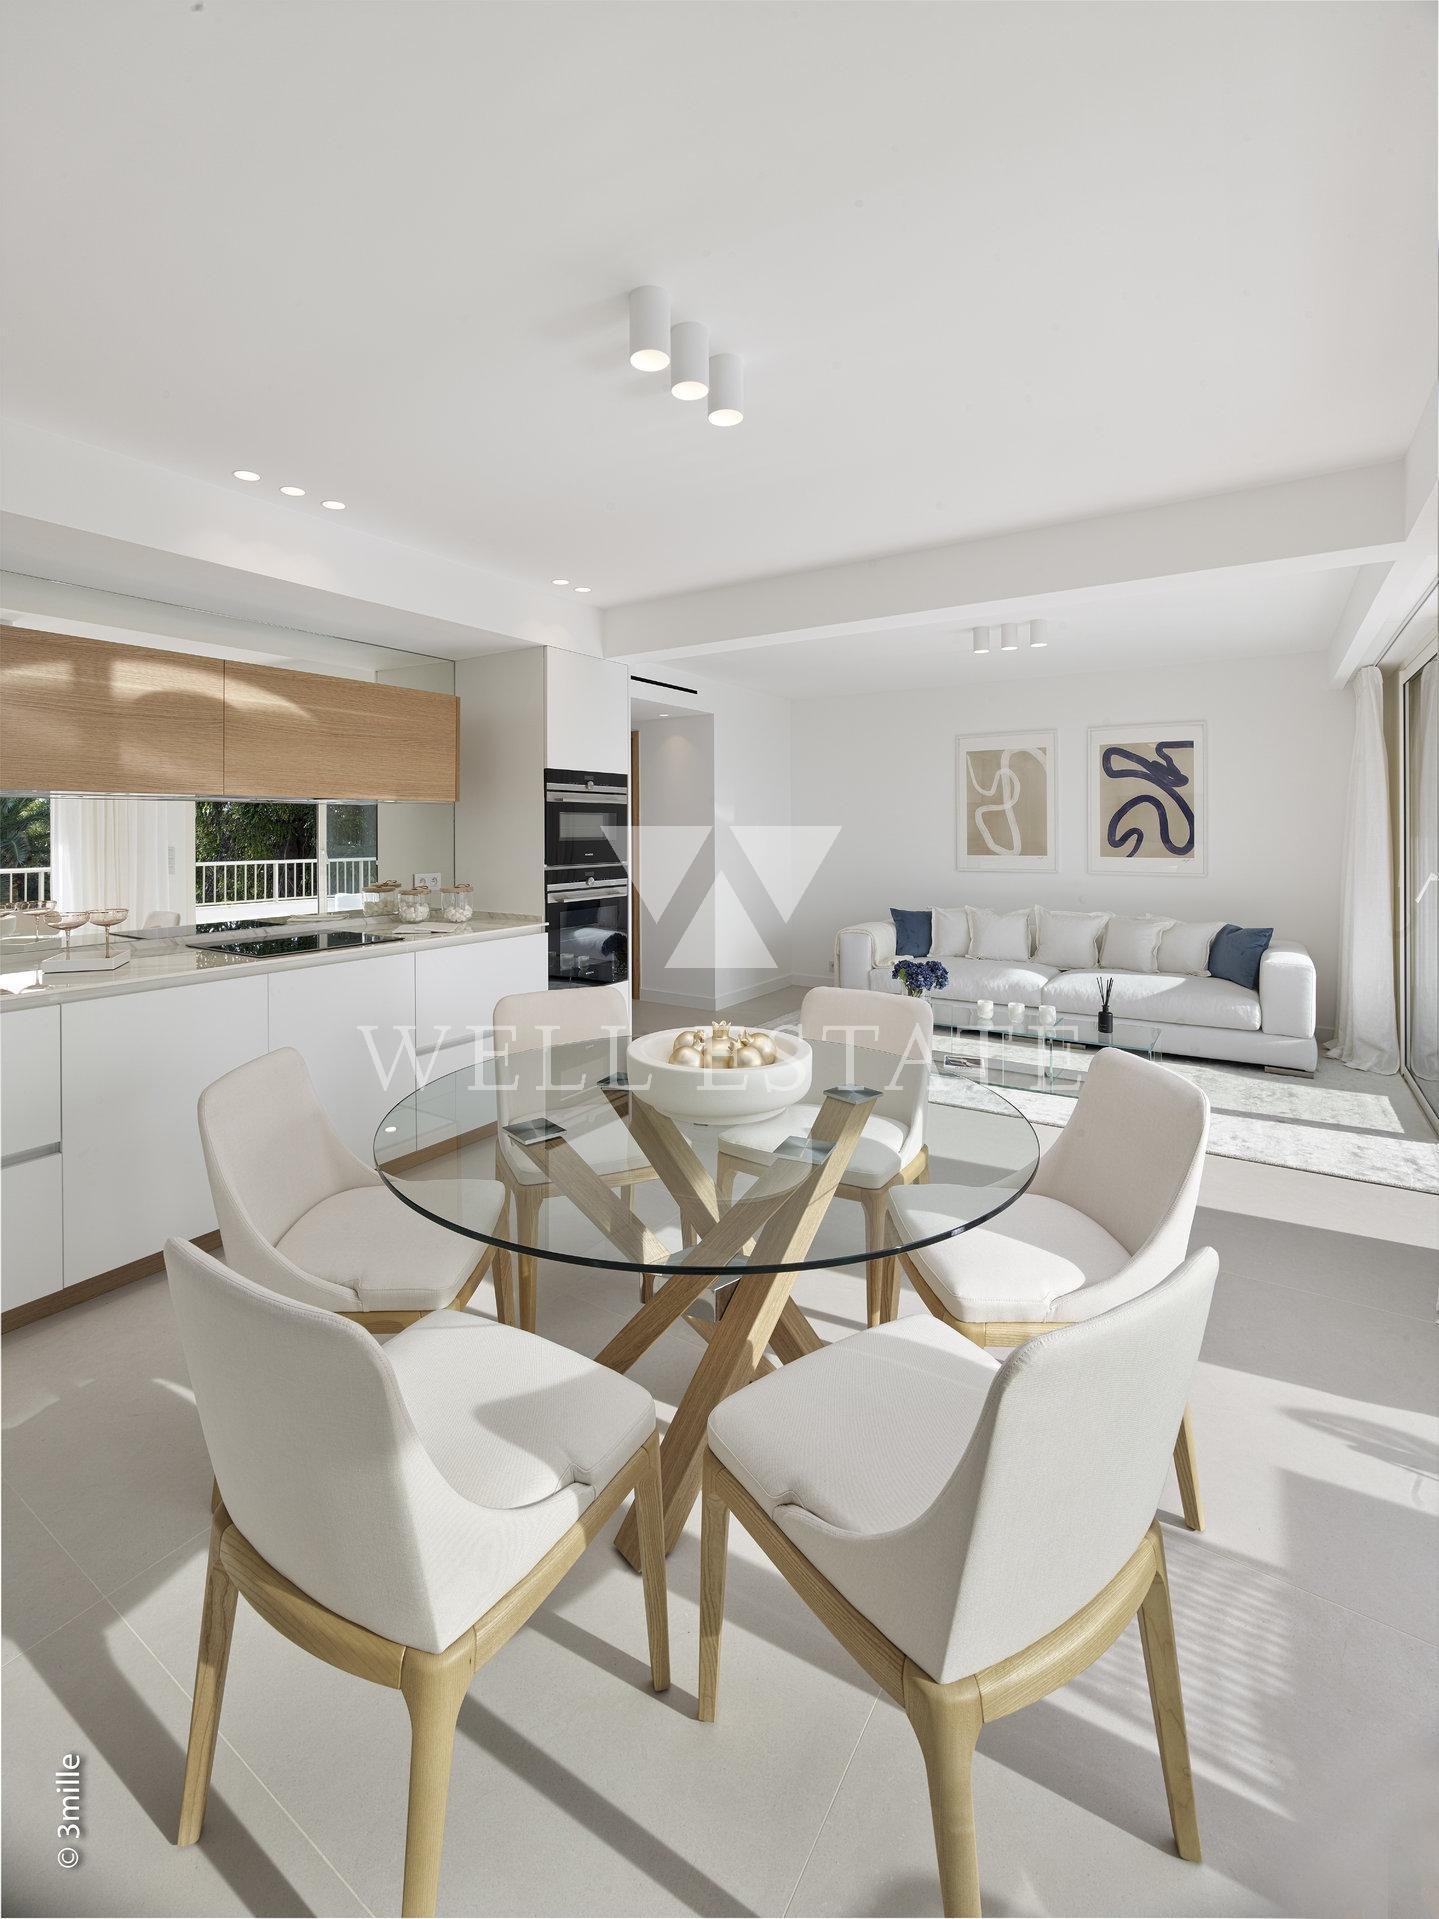 出售 公寓 - 戛納 (Cannes) Californie